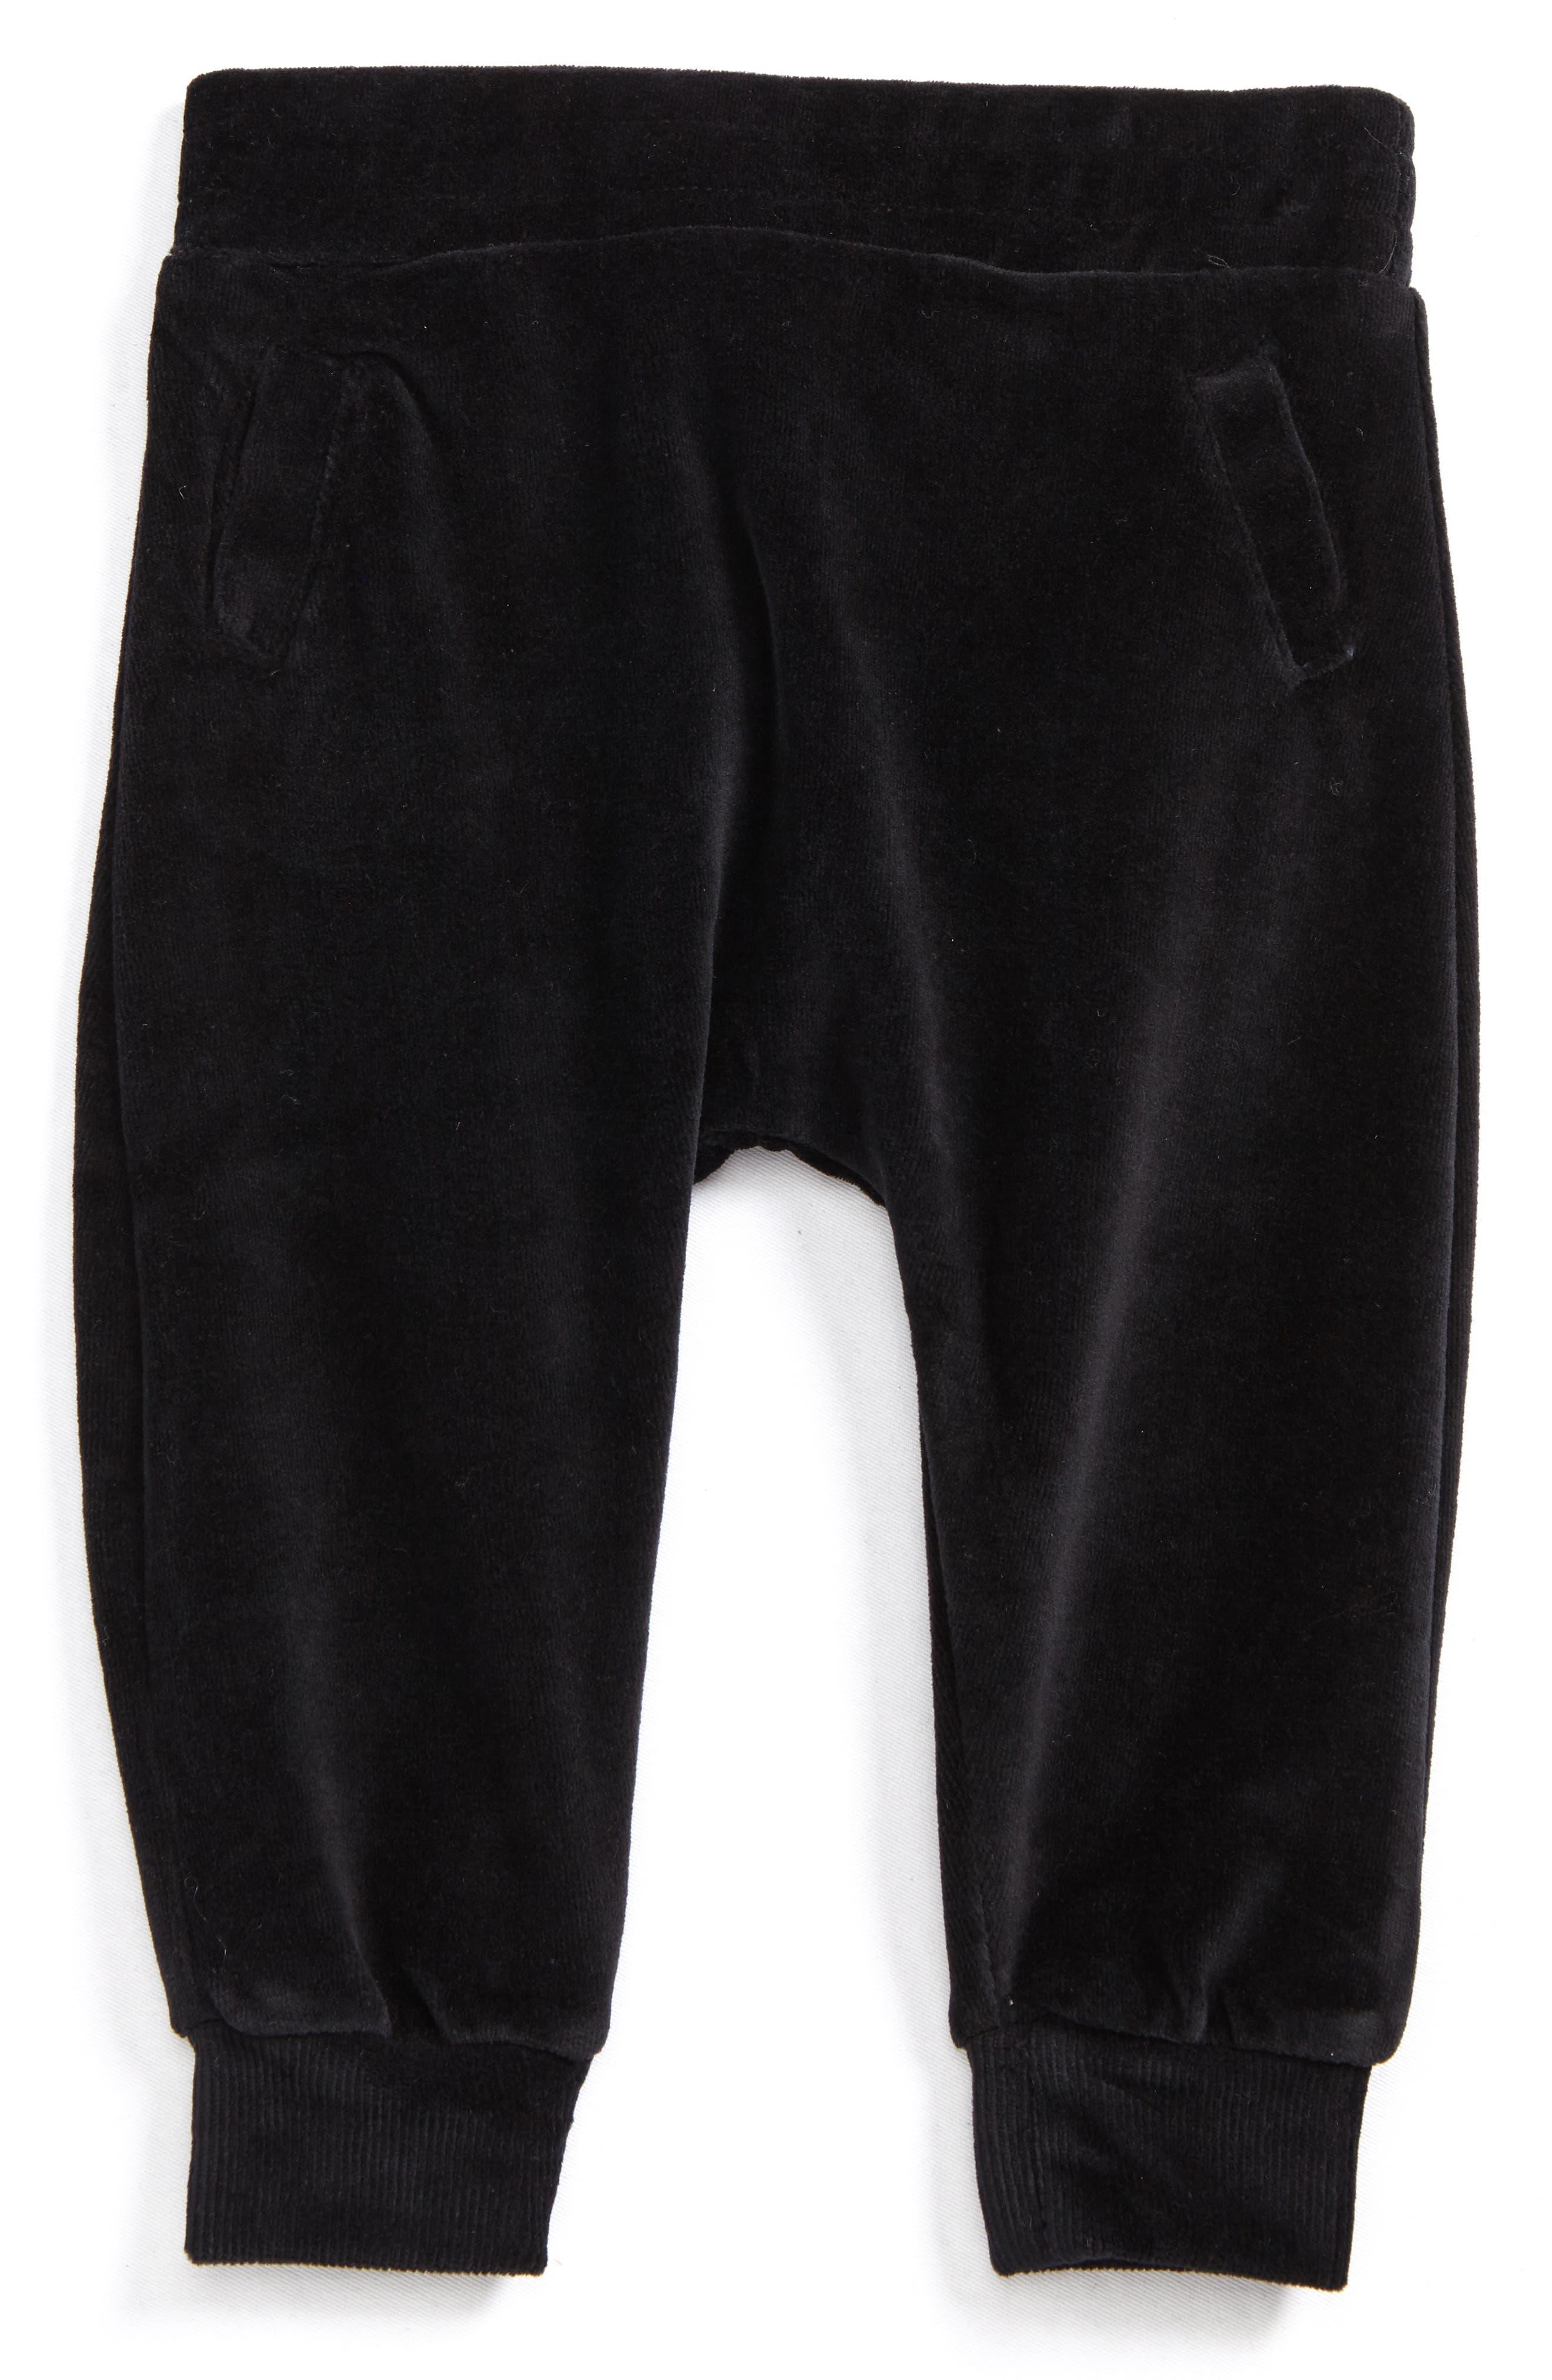 Velour Sweatpants,                             Main thumbnail 1, color,                             Black